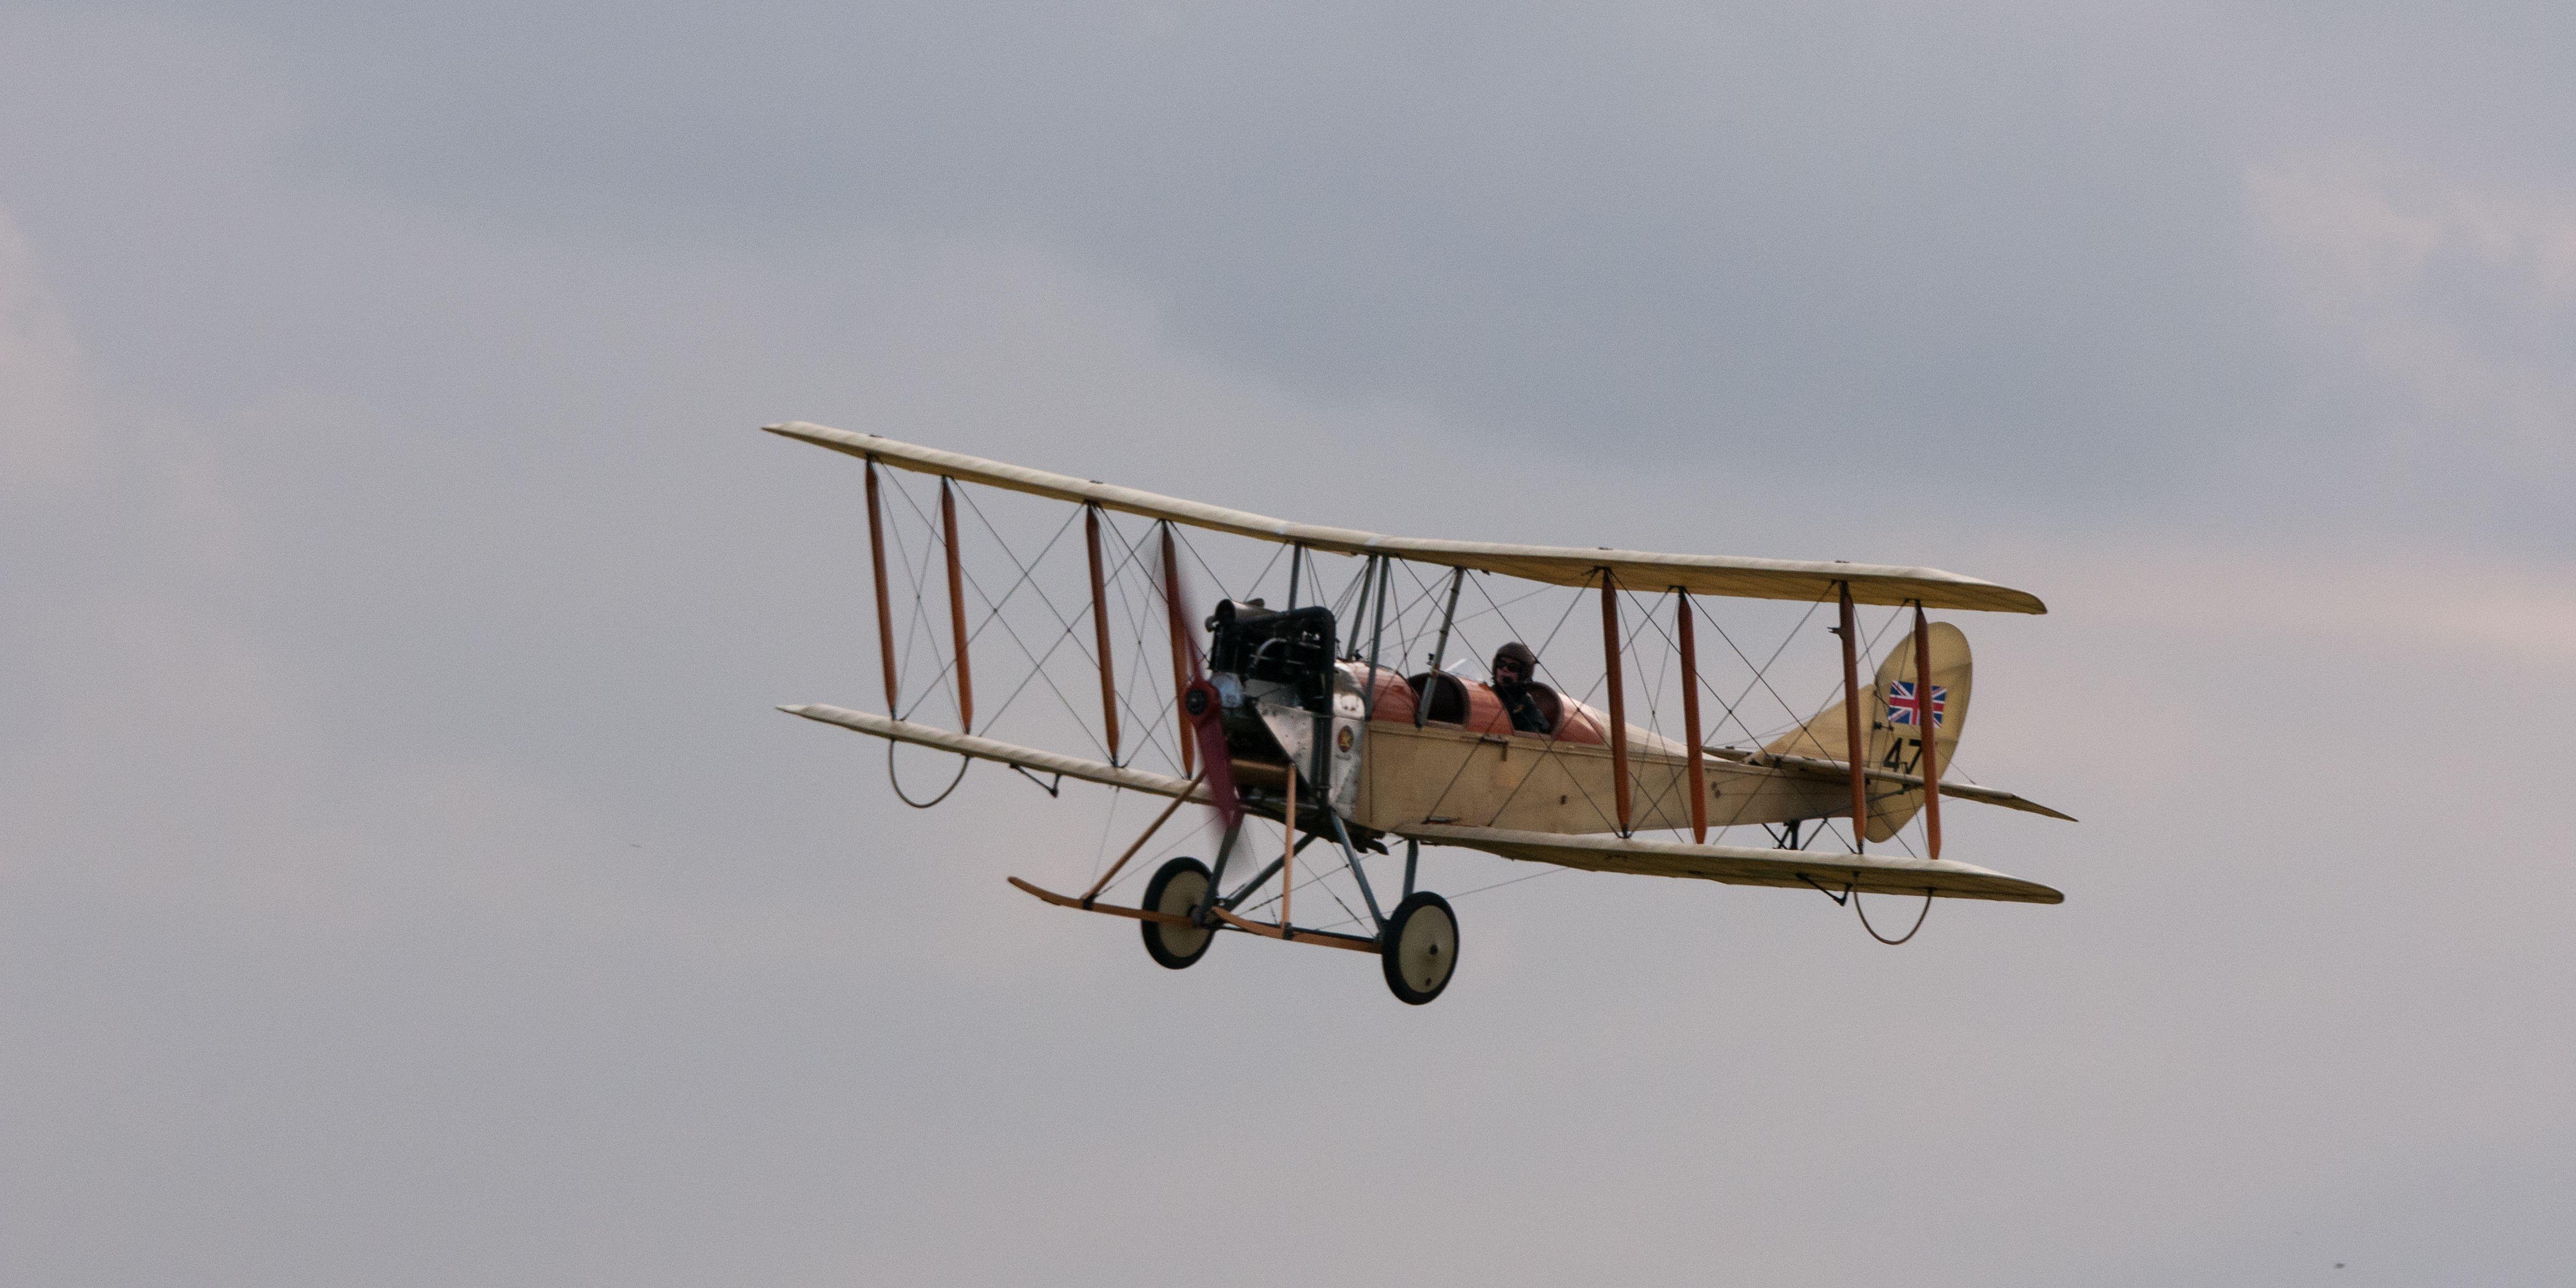 Royal aircraft factory replica bec aircraft jj